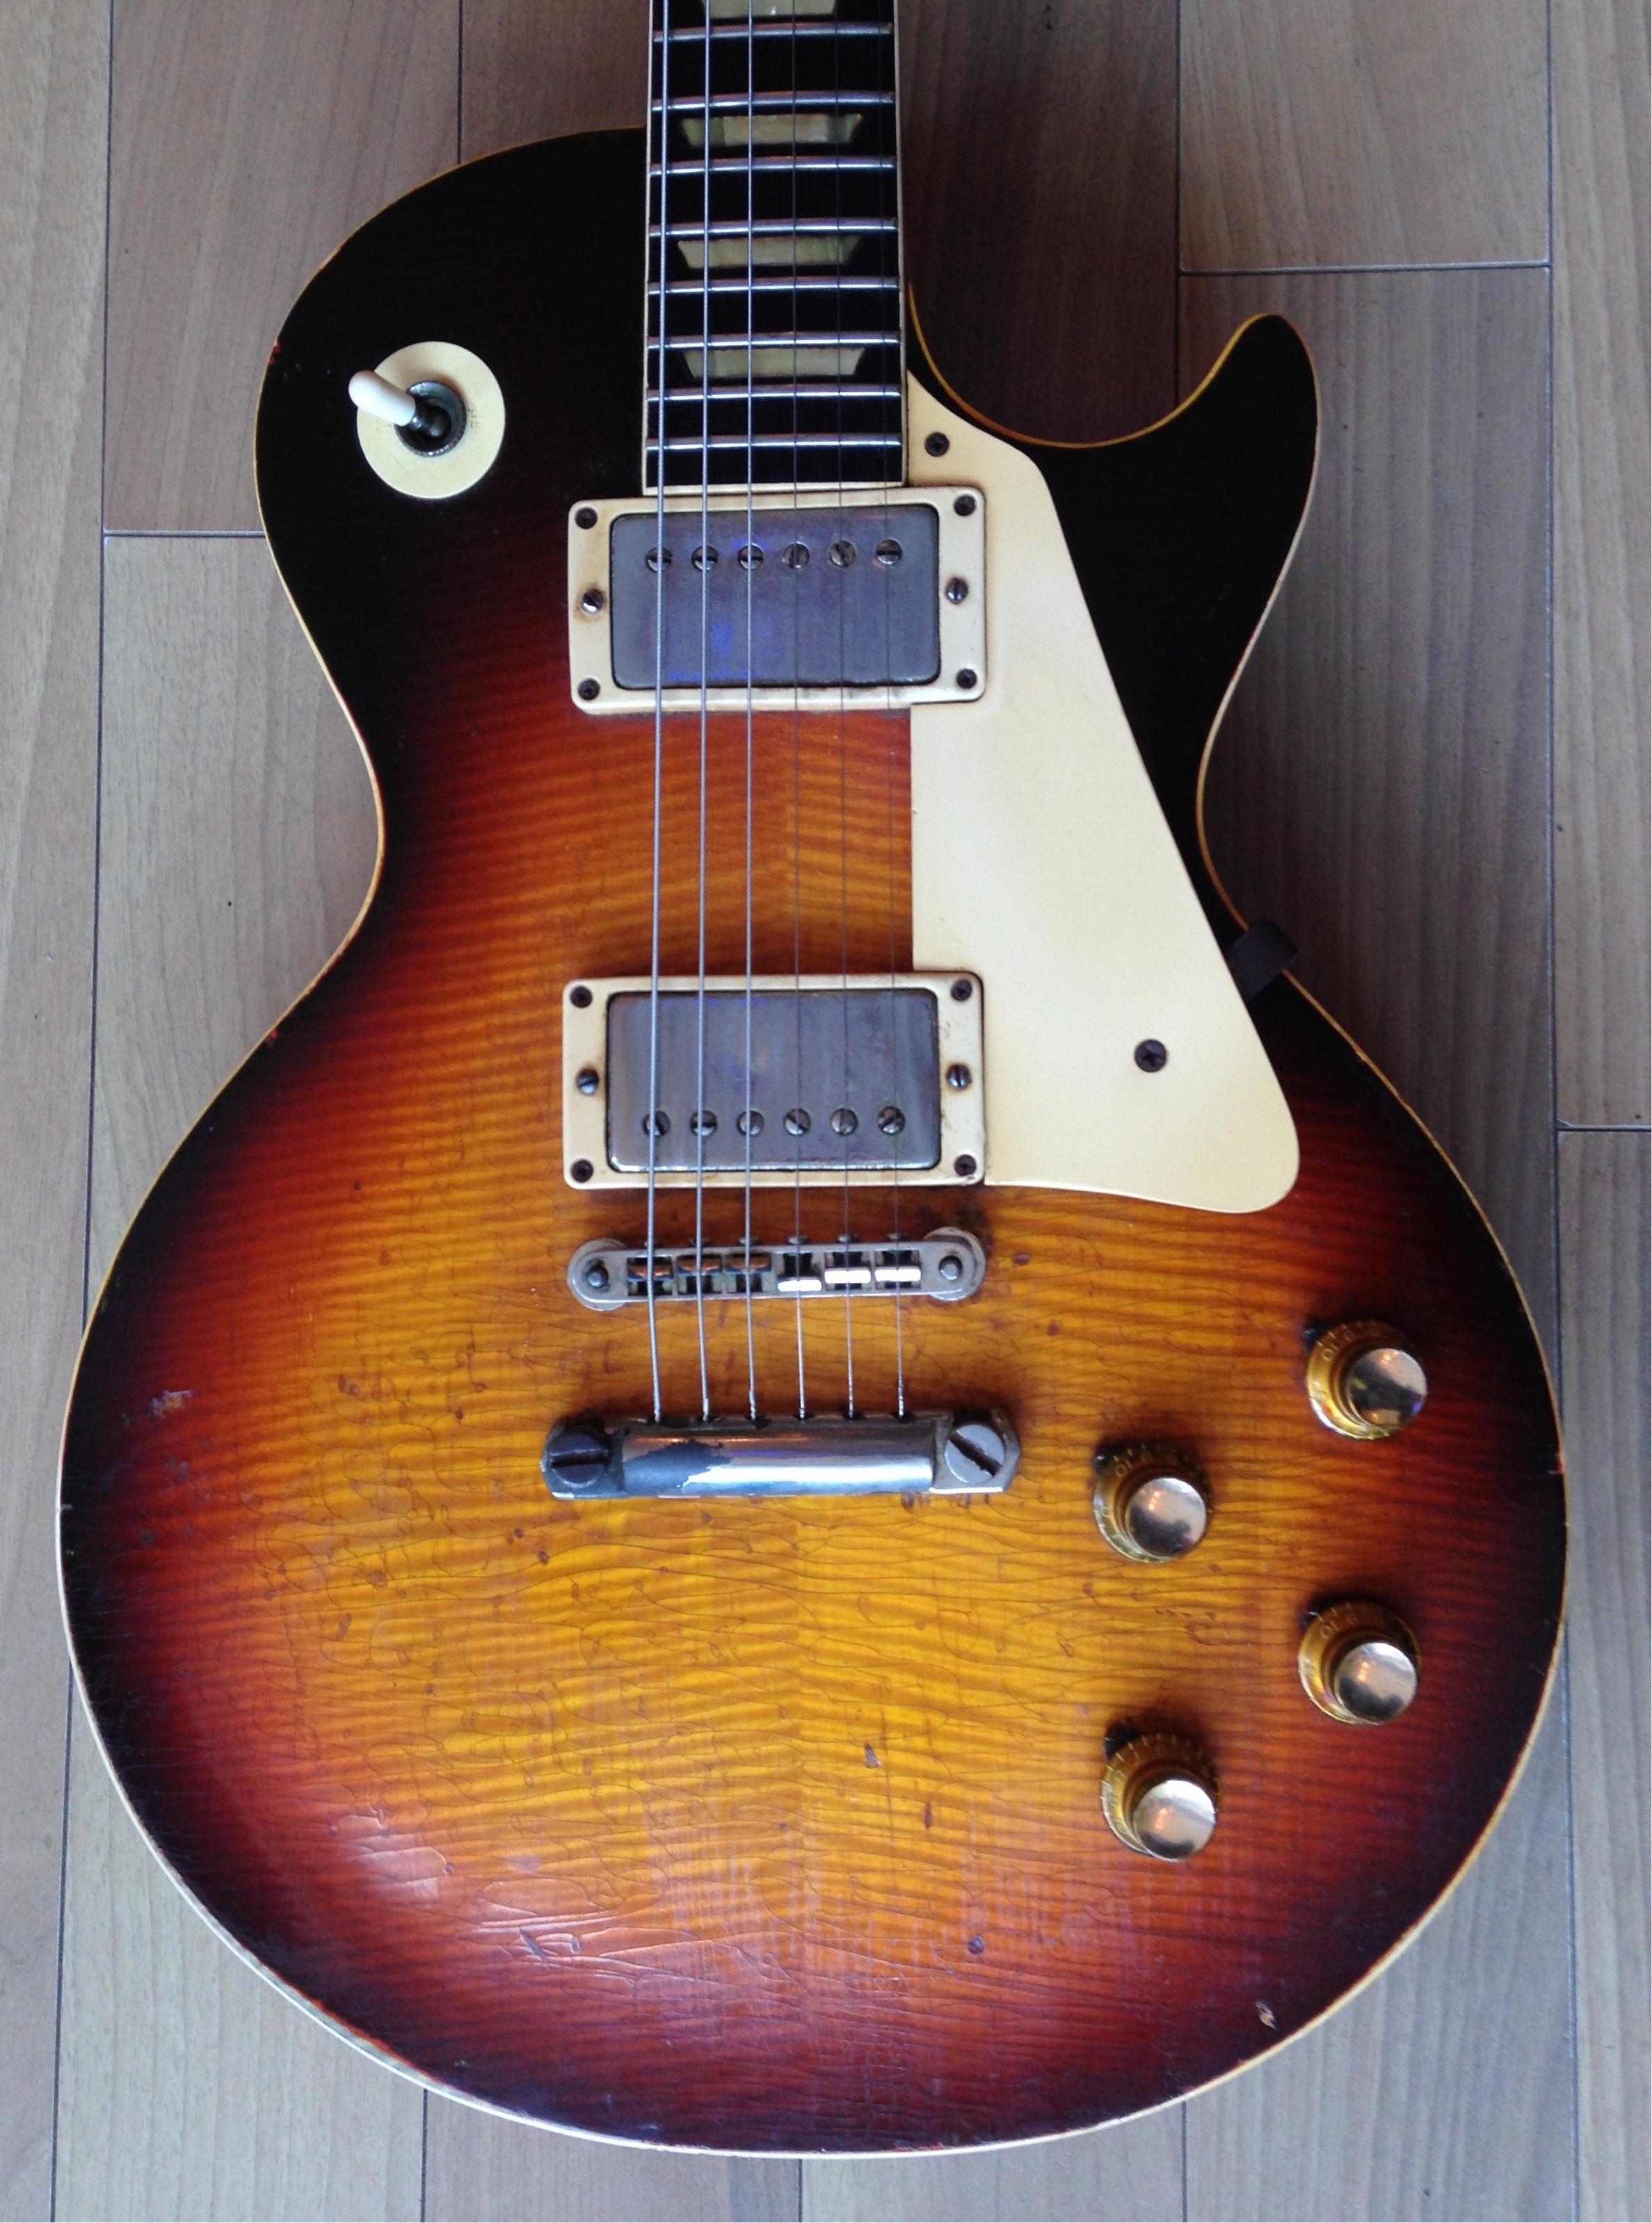 gibson les paul standard the dutch burst 1960 dark burst guitar for sale richard henry guitars ltd. Black Bedroom Furniture Sets. Home Design Ideas